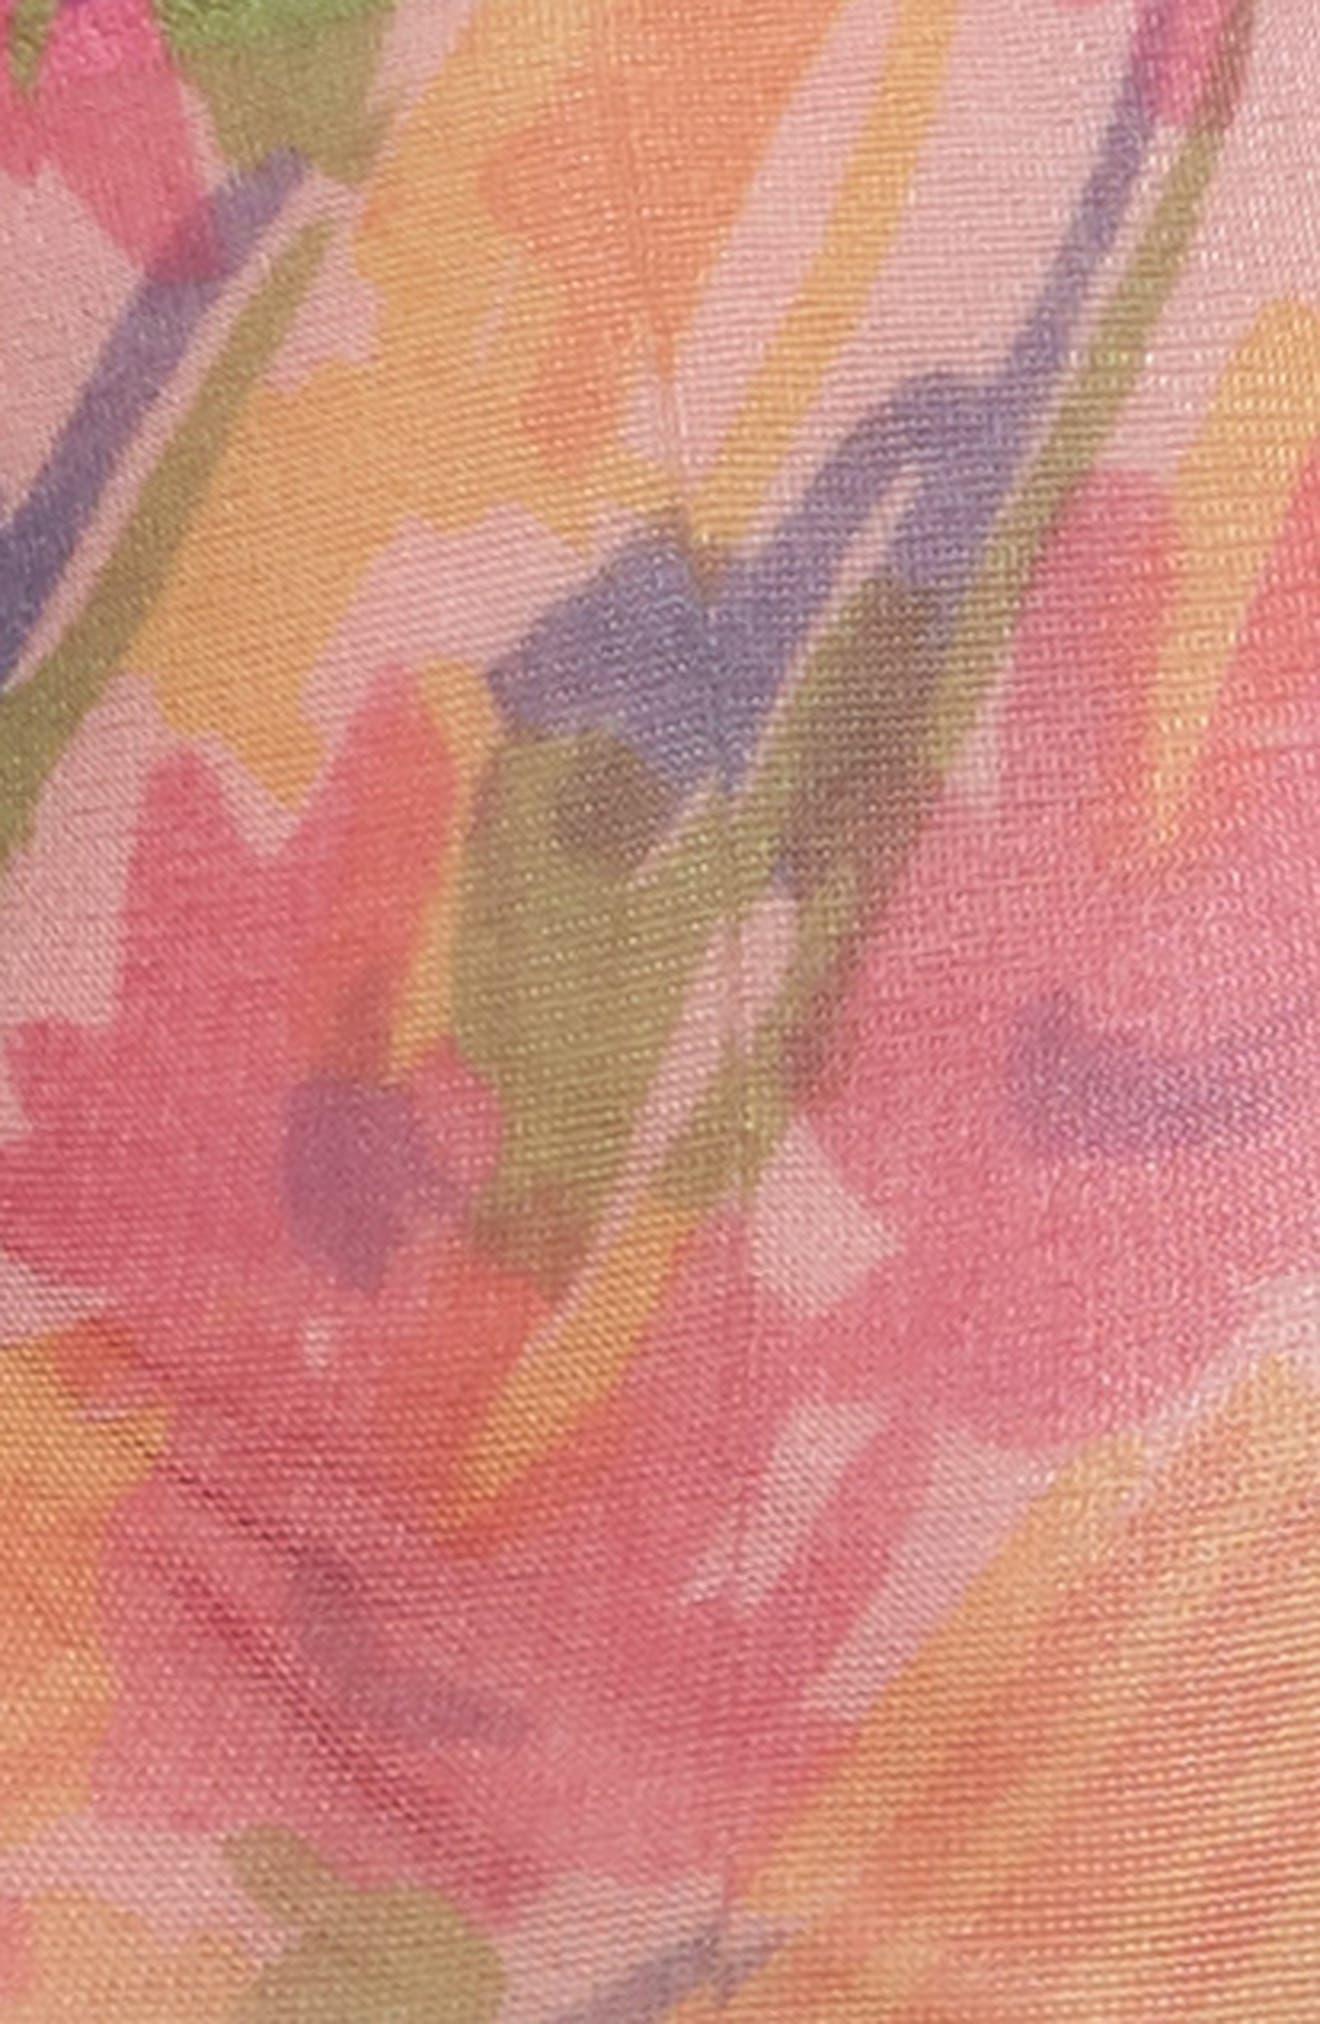 Benedetta Ankle Socks,                             Alternate thumbnail 3, color,                             Fiore Astratto